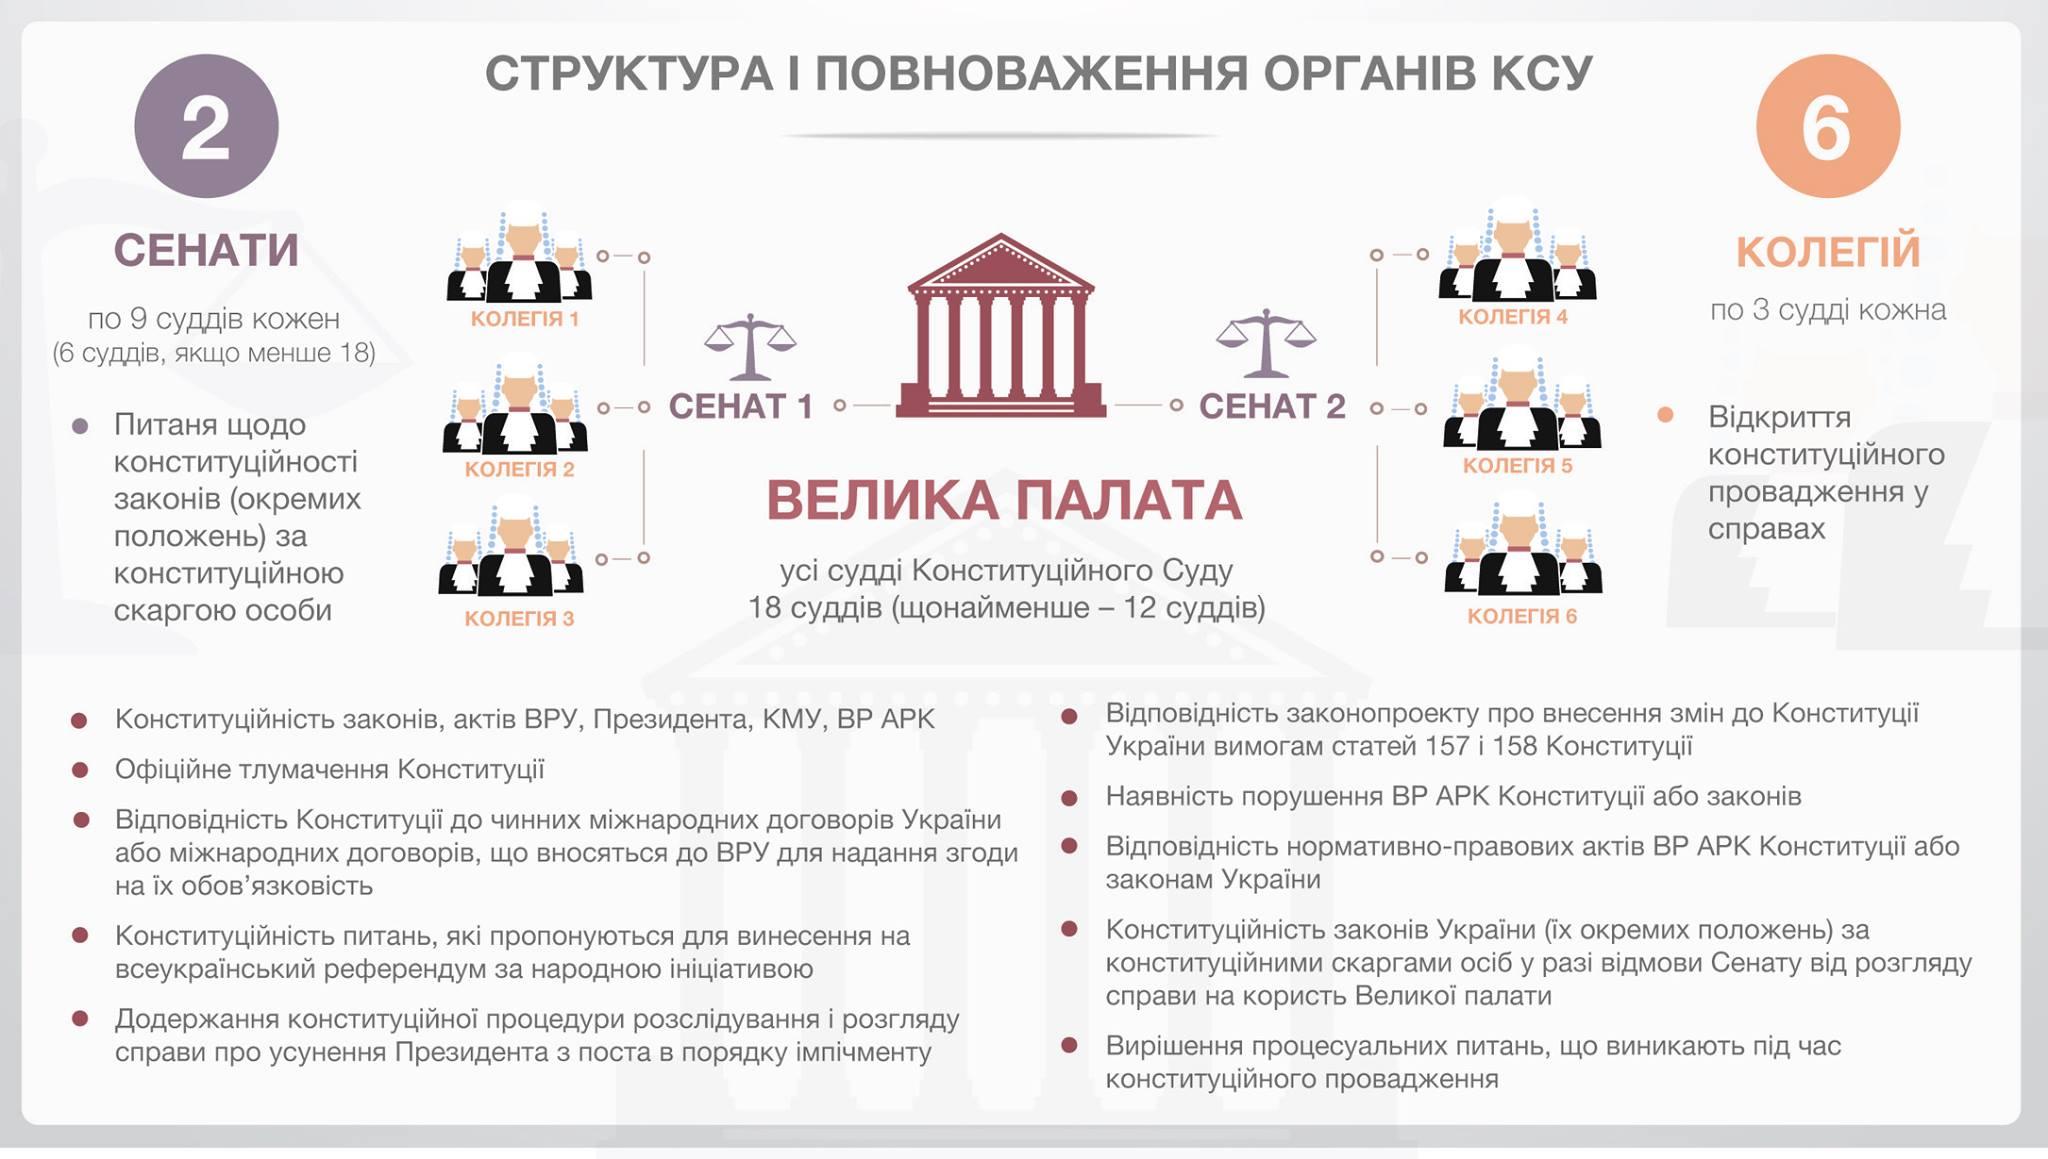 Рада взялась за реформу Конституционного суда